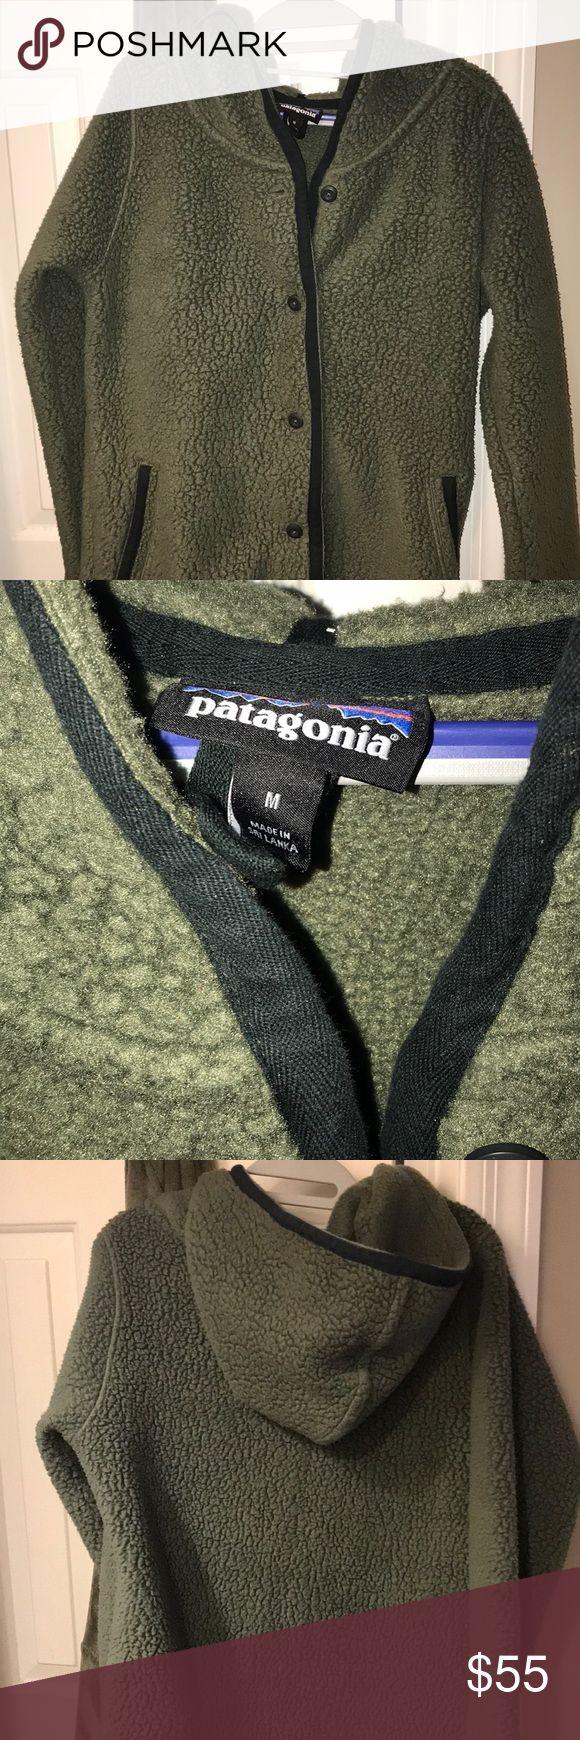 Patagonia synchilla jacket never worn Patagonia Jackets & Coats